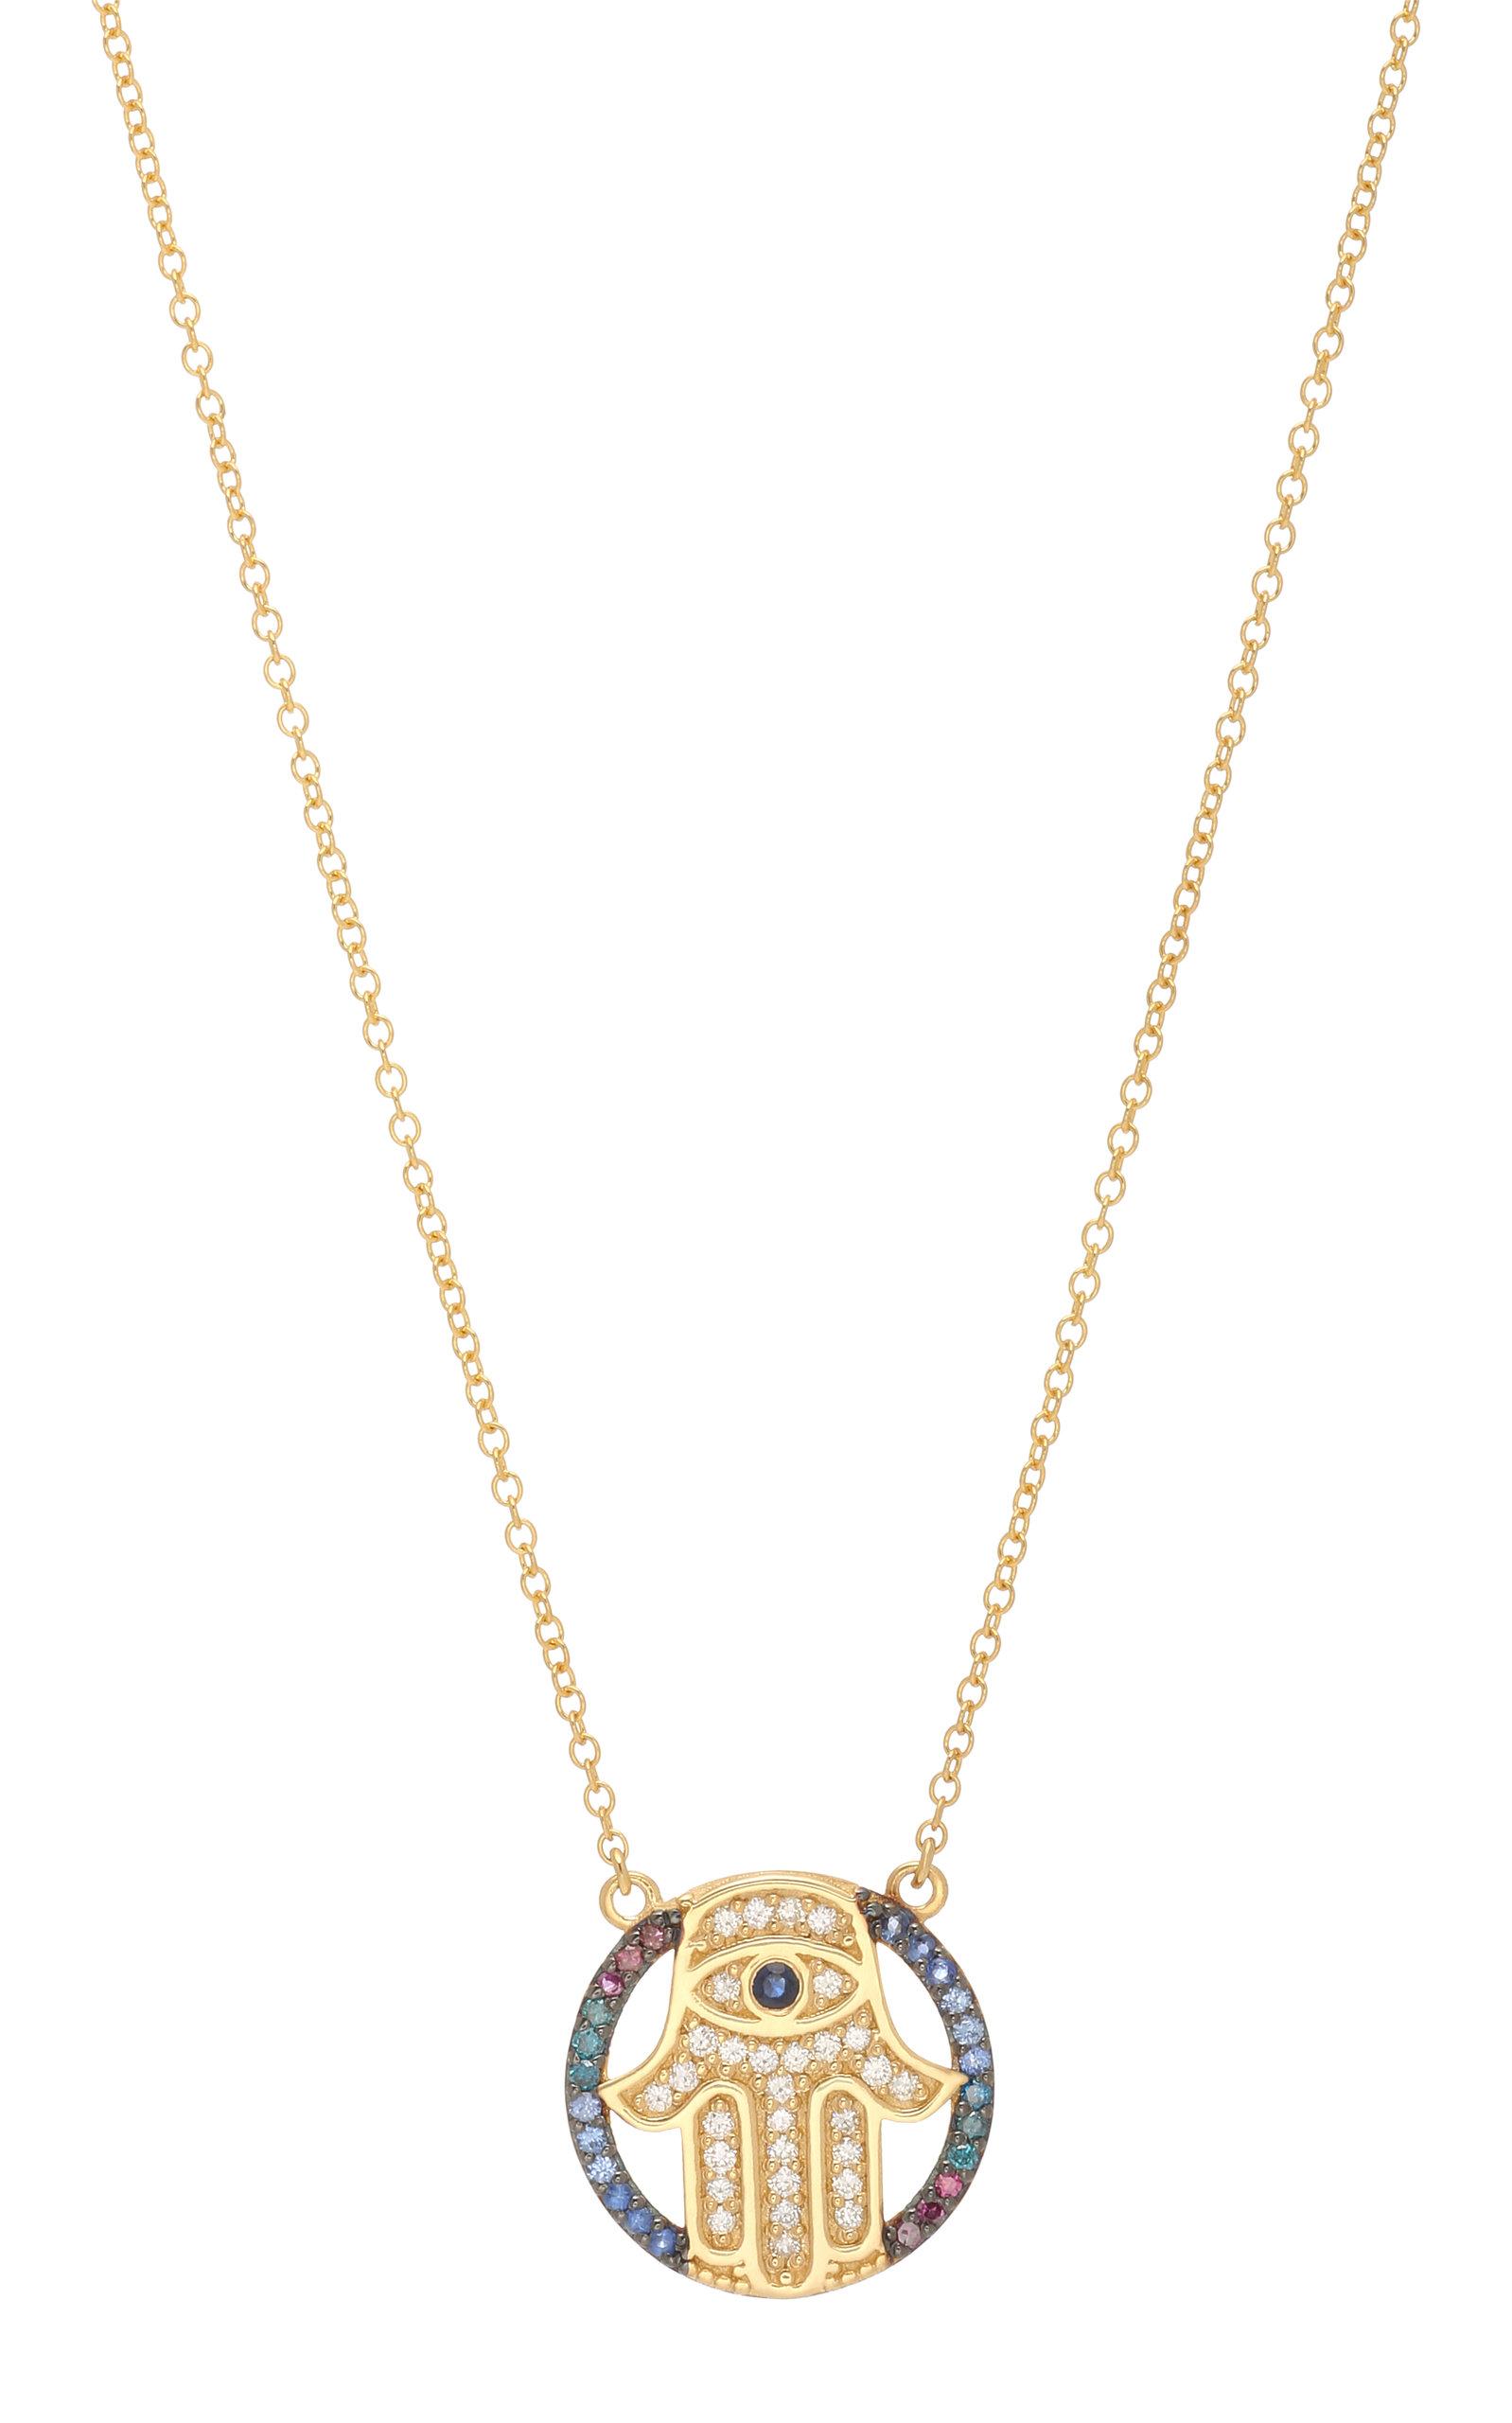 Mini Hamza 14K Gold Diamond and Sapphire Necklace Marianna Goulandris HhduDn2cu8